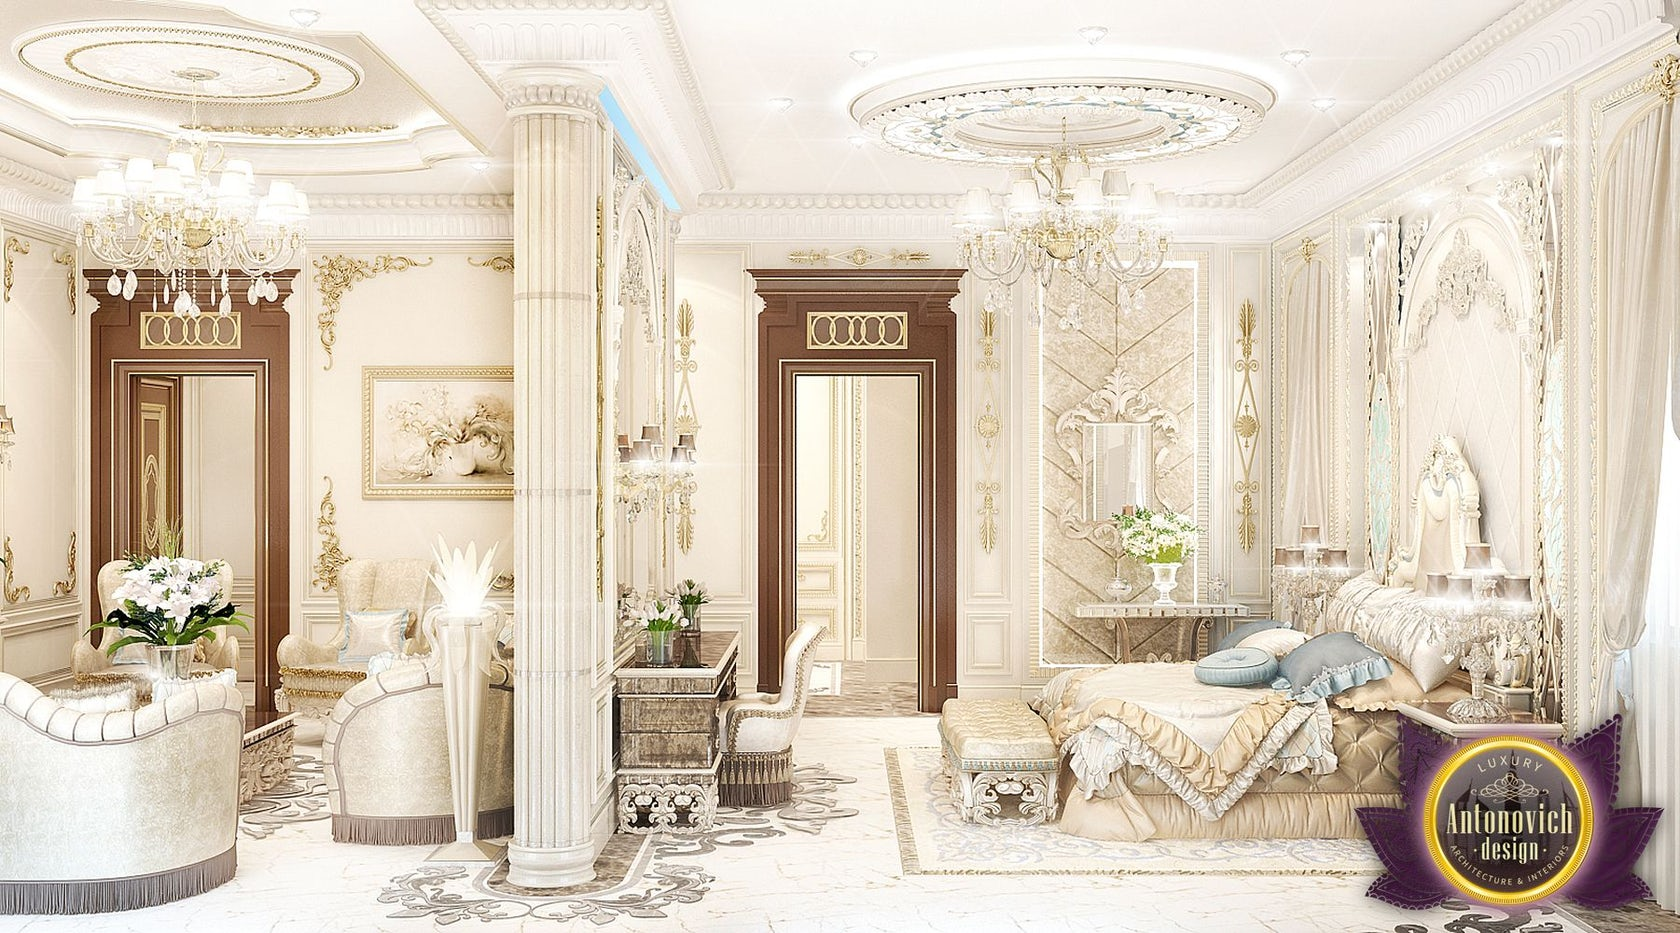 Luxury Royal Arabic Master Bedroom Of Luxury Antonovich Design On Architizer